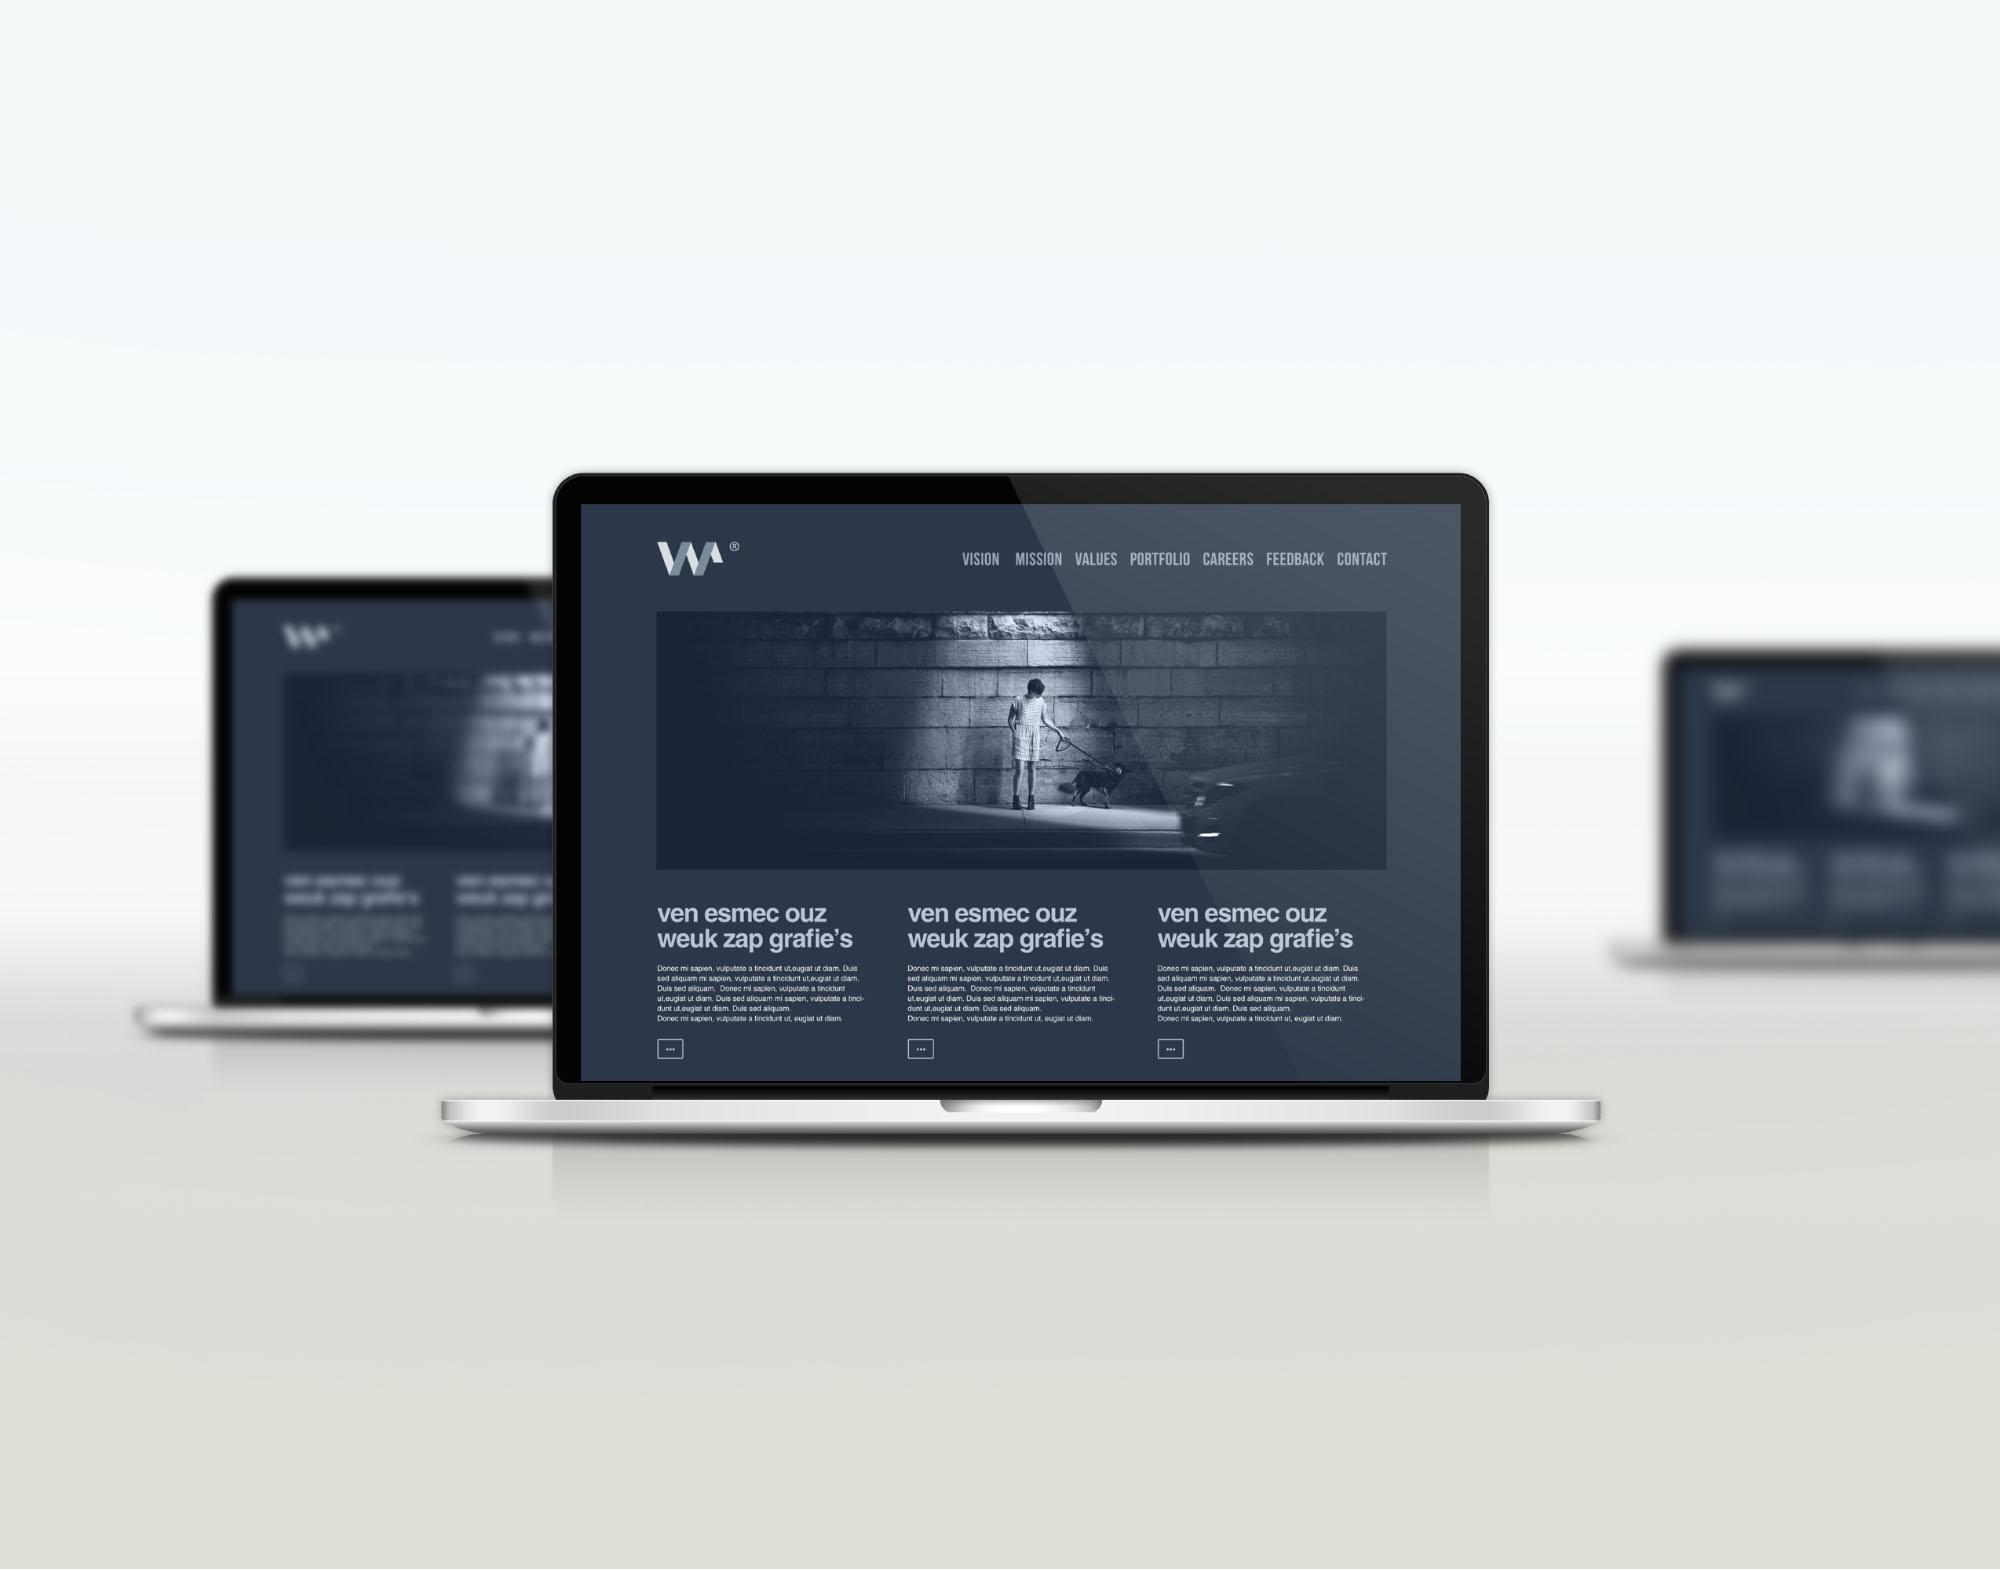 Responsive Device Mockup - Mac pro